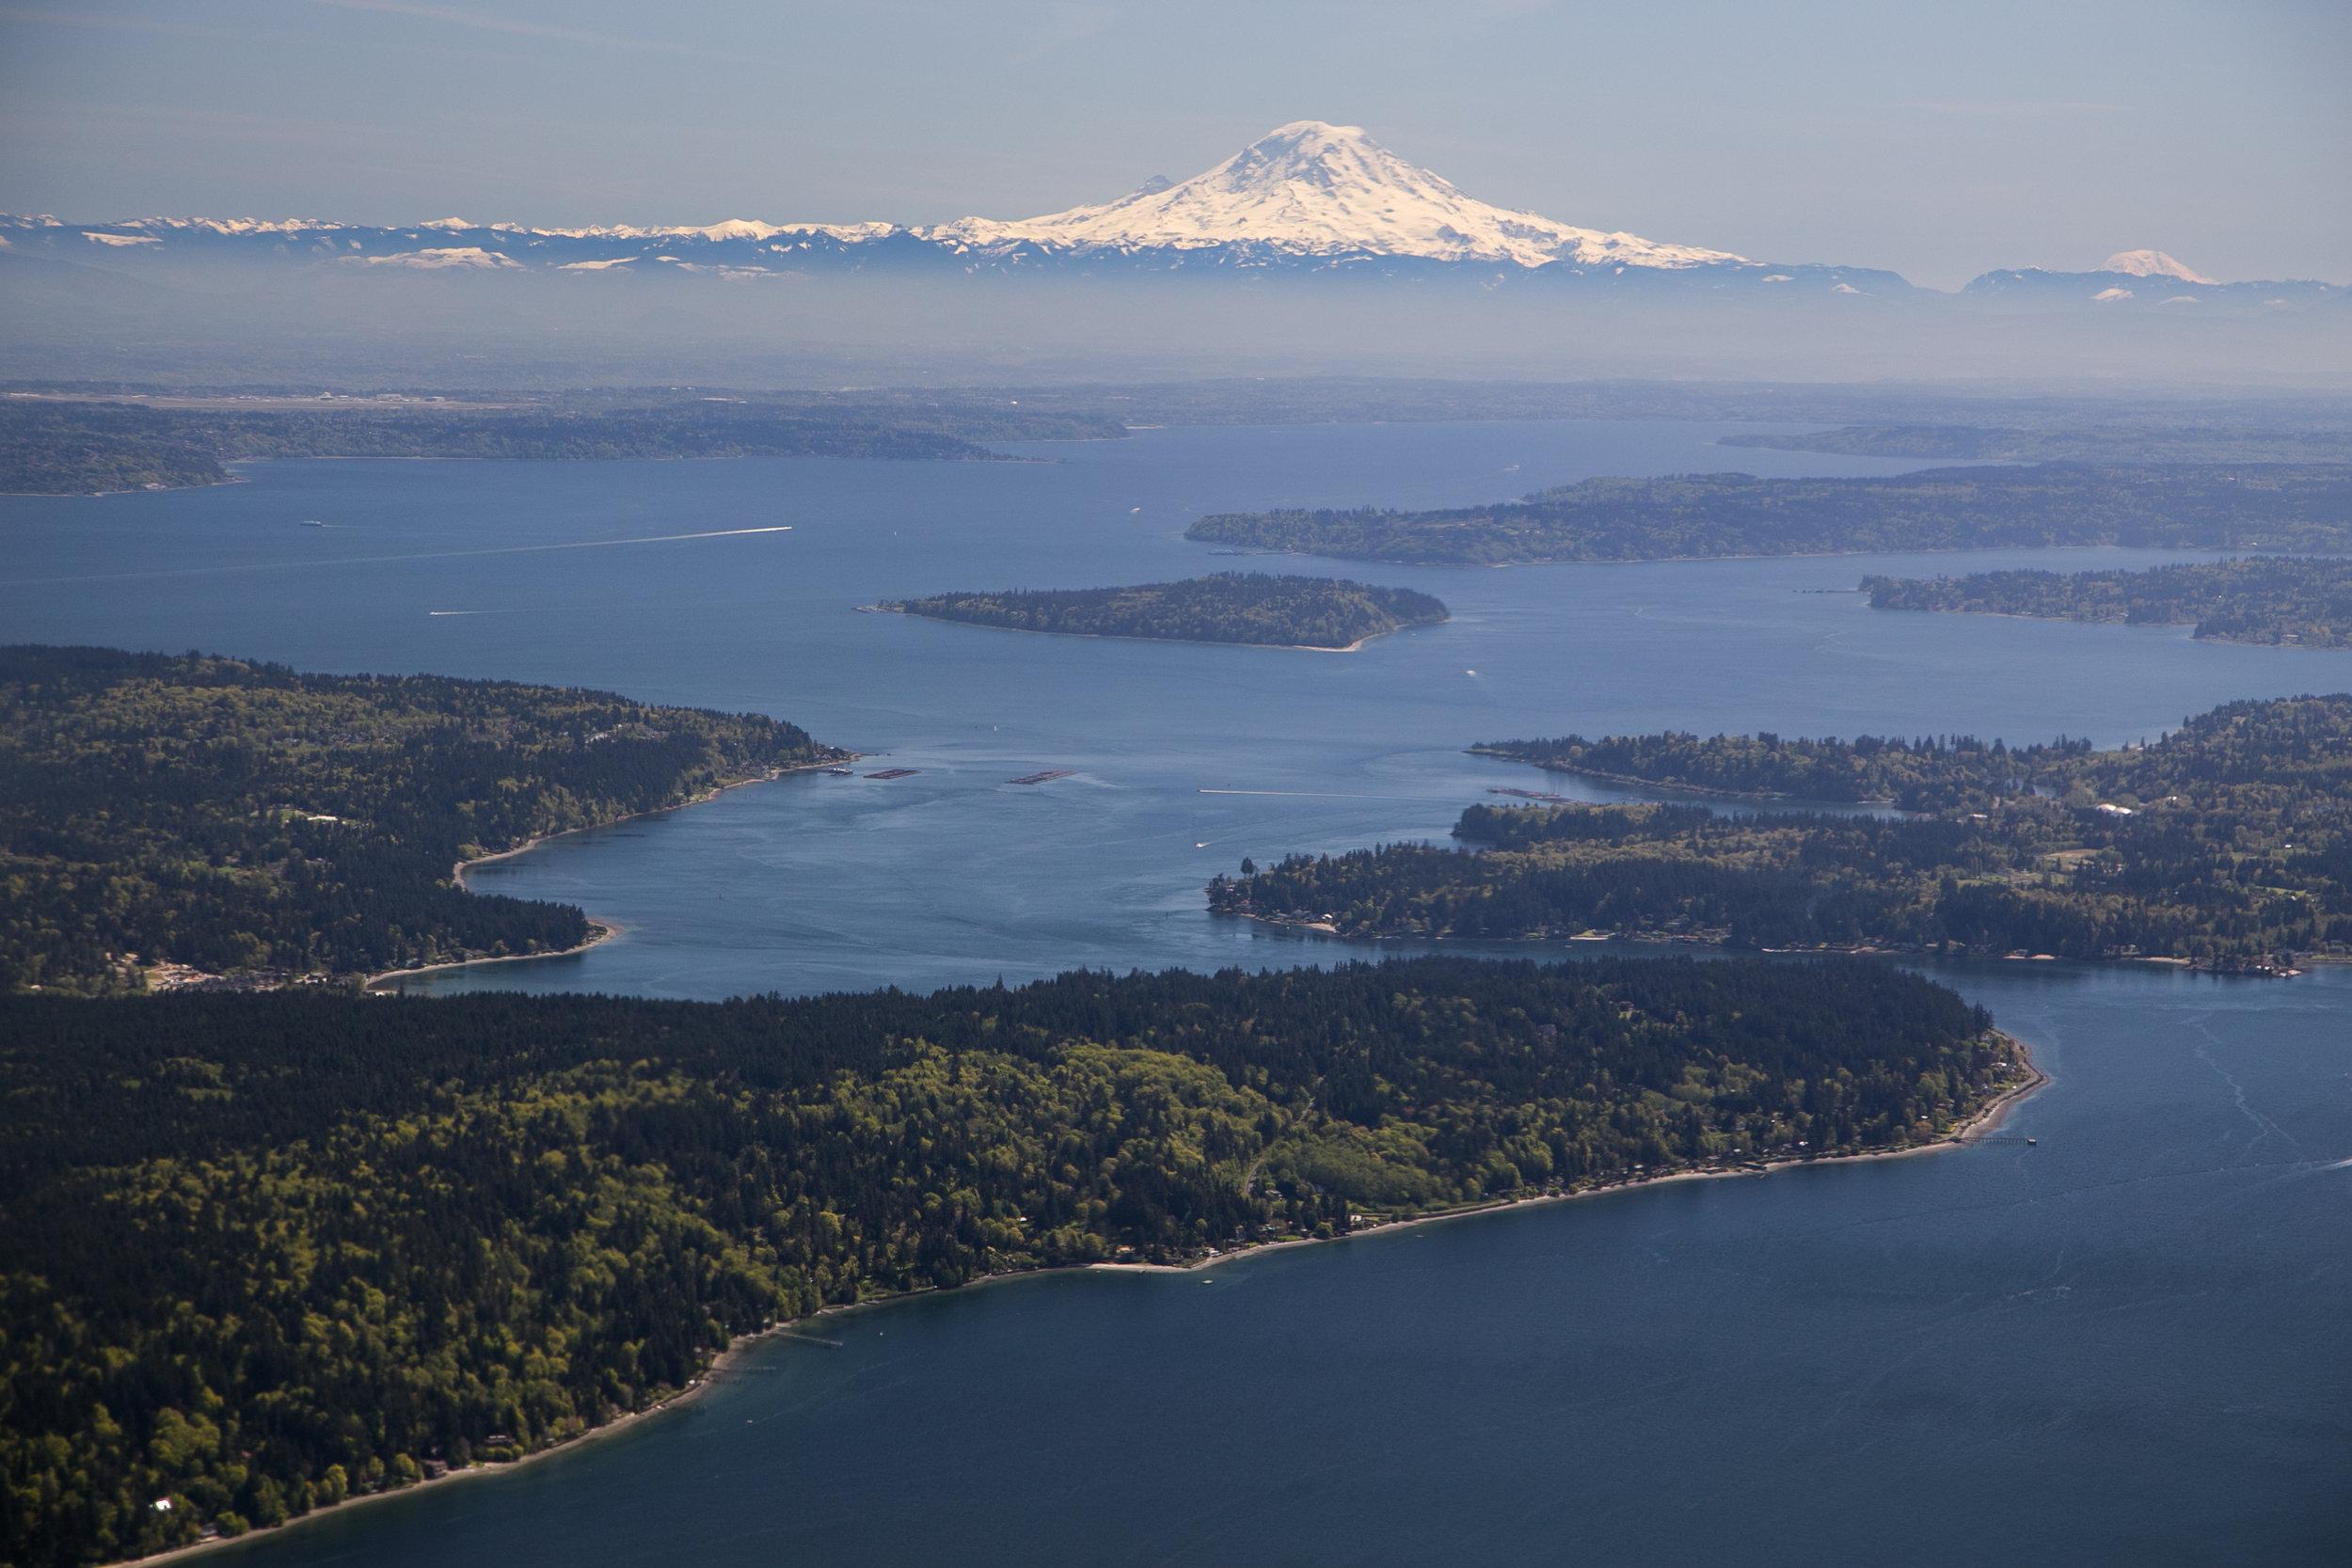 Bird's eye view of Puget Sound. Photo by John Marshall.